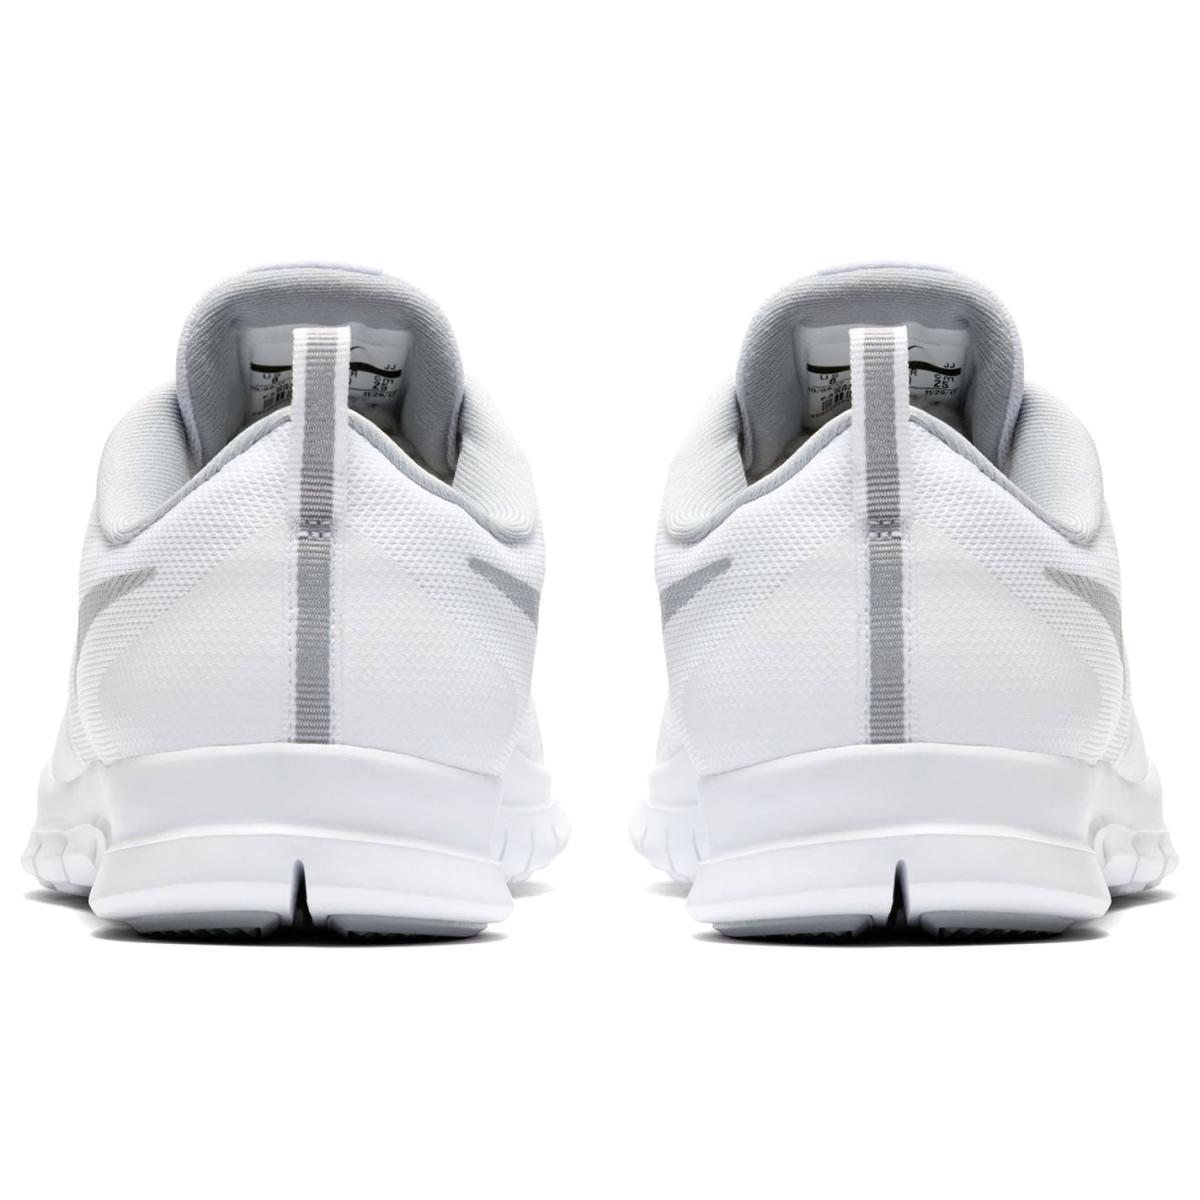 Nike-Flex-Laufschuhe-Turnschuhe-Damen-Sneaker-Sportschuhe-Jogging-3088 Indexbild 29